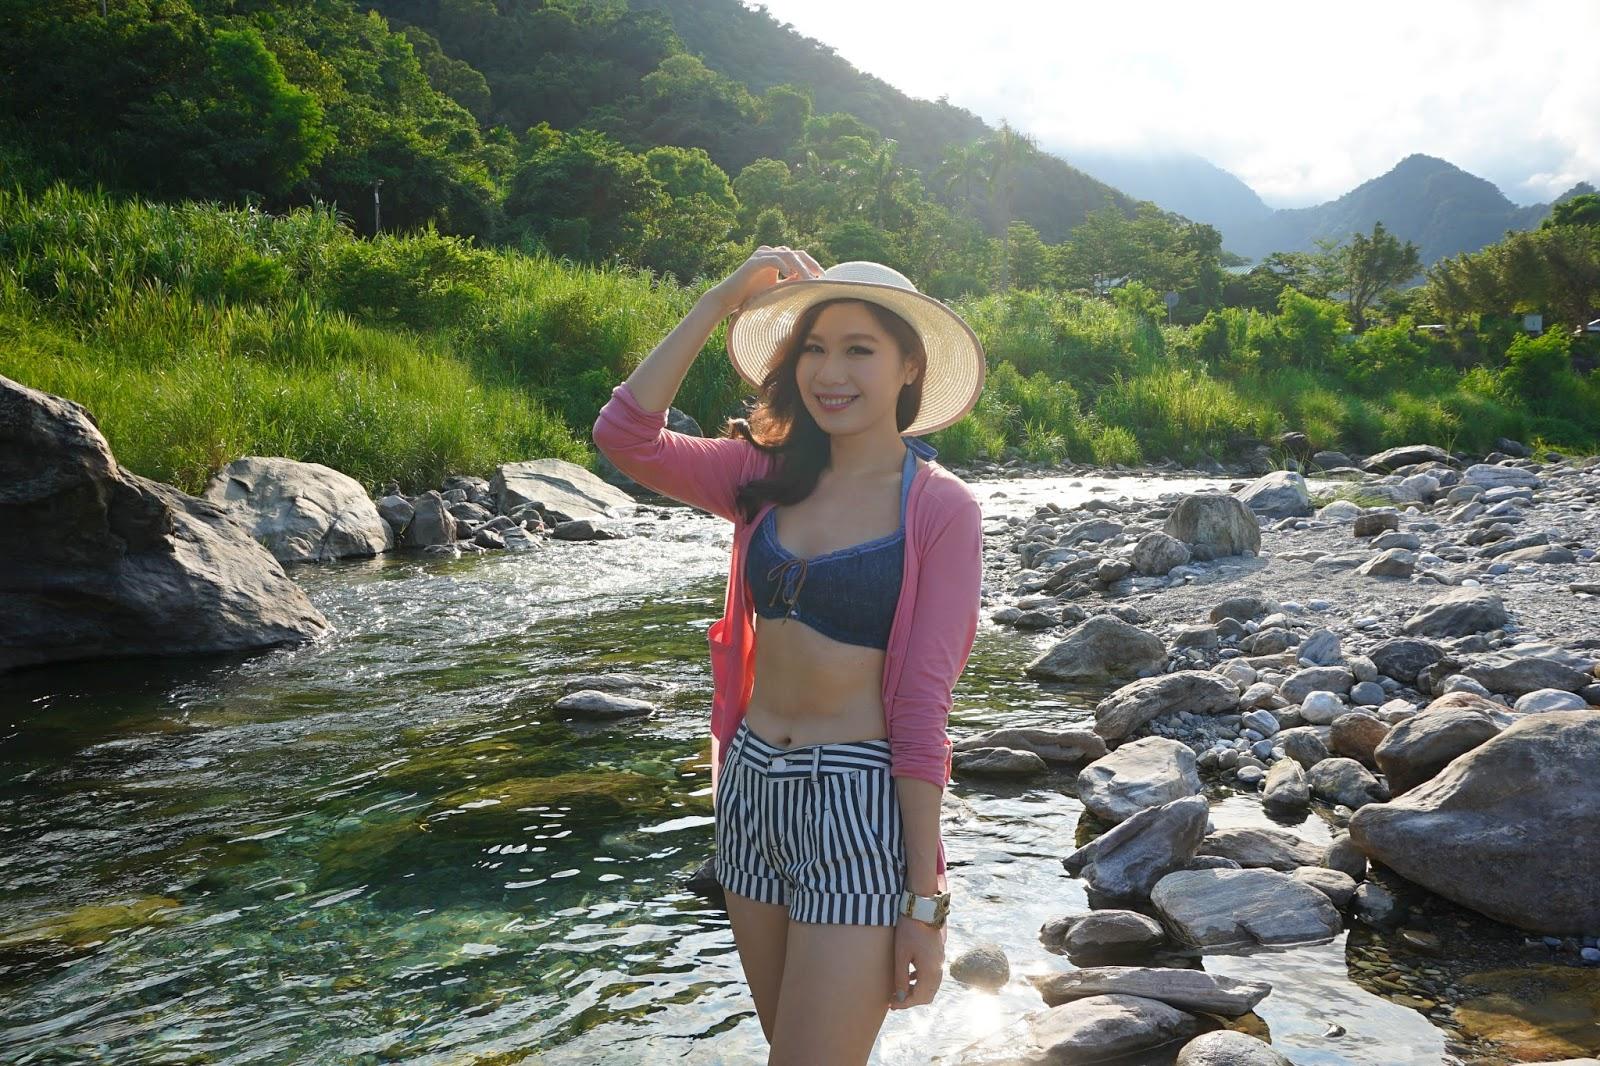 6-%25E6%259C%25AA%25E5%2591%25BD%25E5%2590%258D-IMG_2032-beautyanxiety.com-hualien-travel-sanzhan-river